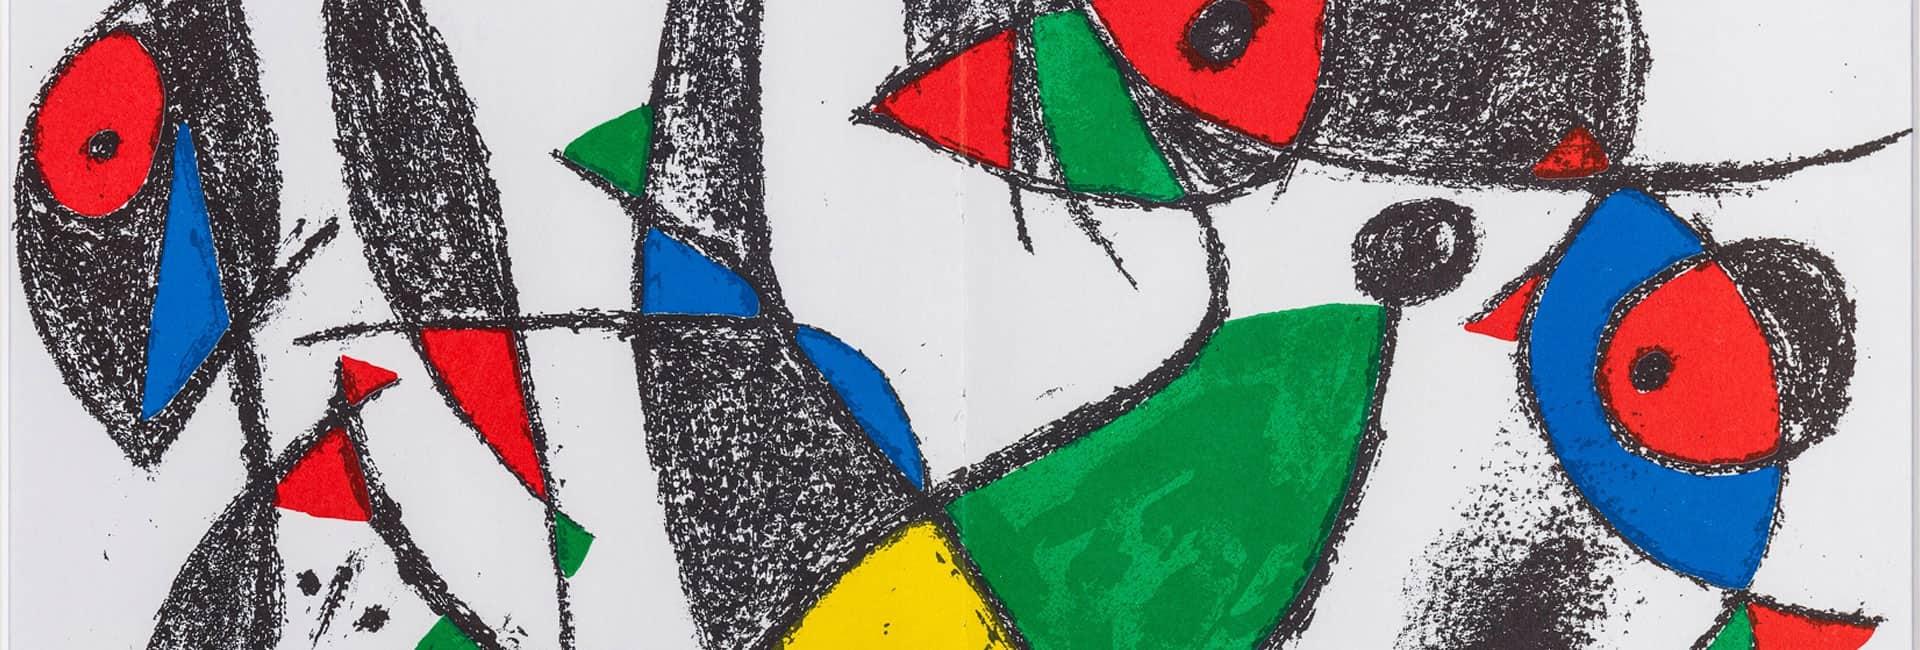 Joan MIRÓ (1893 - 1983) 'Kompozycja X/IV', 1972 by Galeria Nautilus (detail)